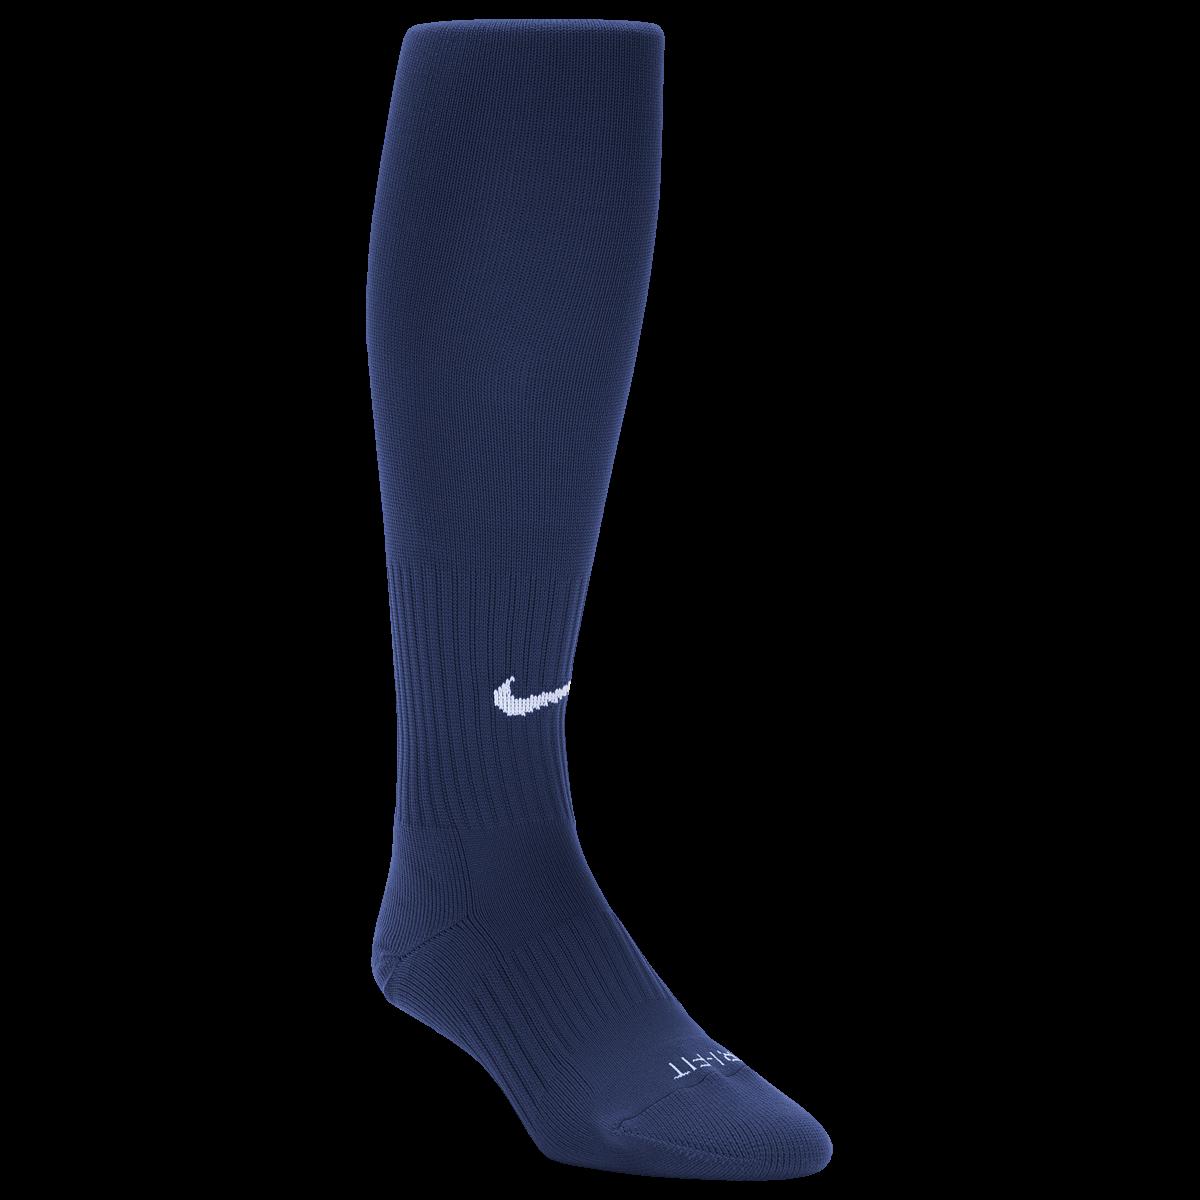 Nike Classic Soccer Socksyellow/blackl Soccer socks